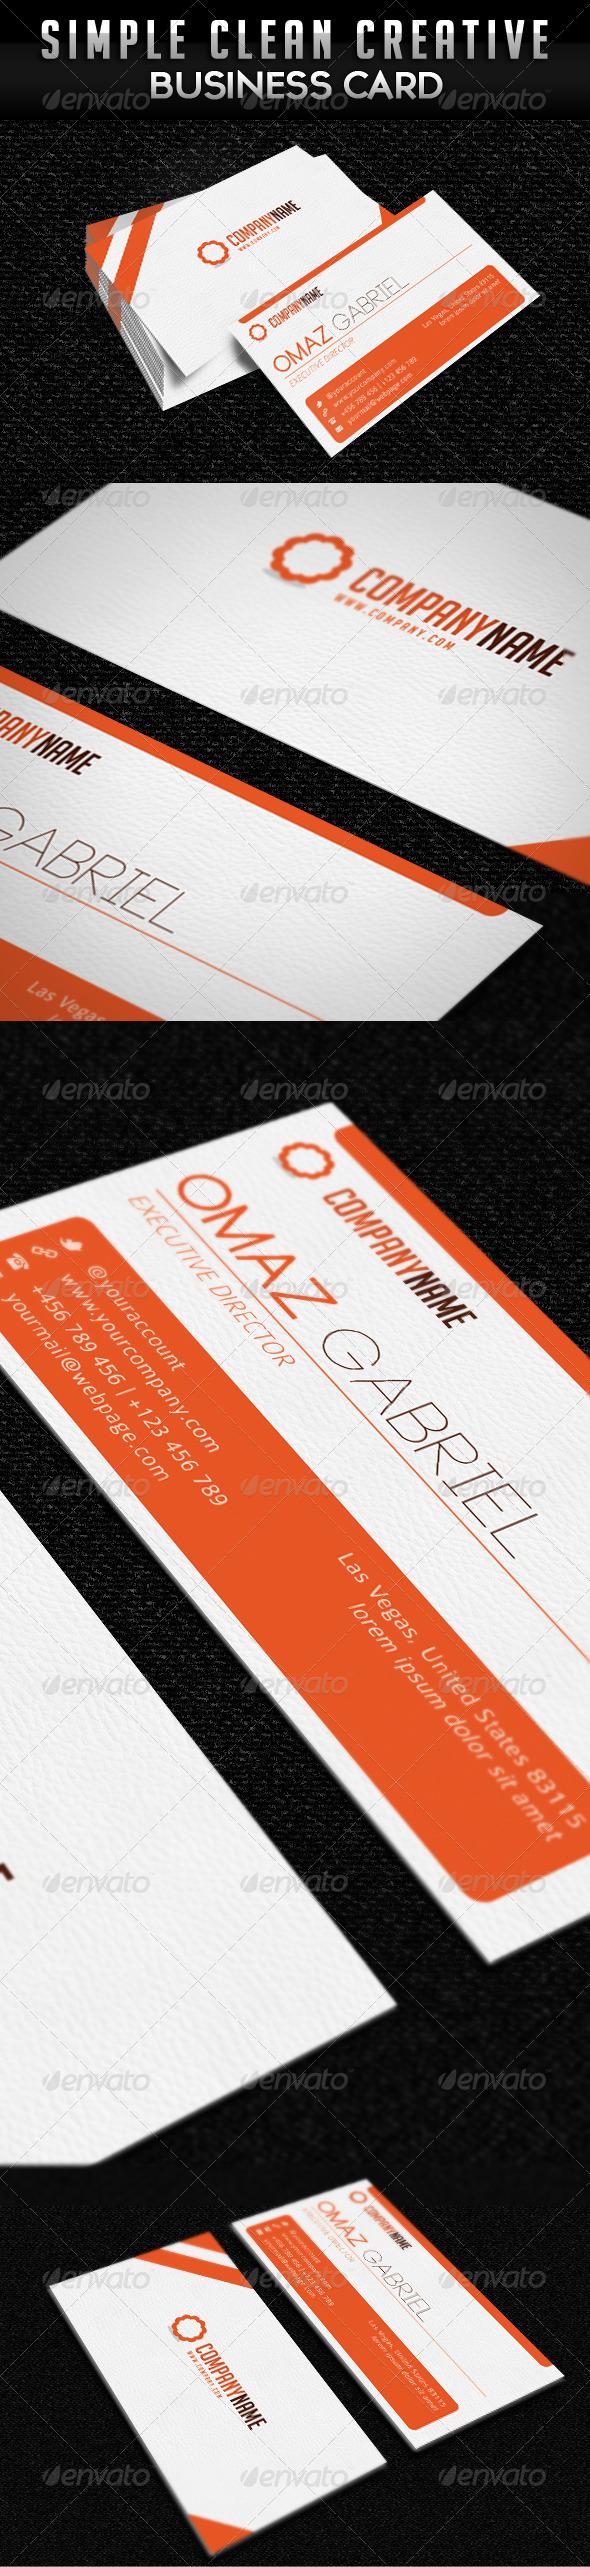 Simple Clean Minimalist Business Card